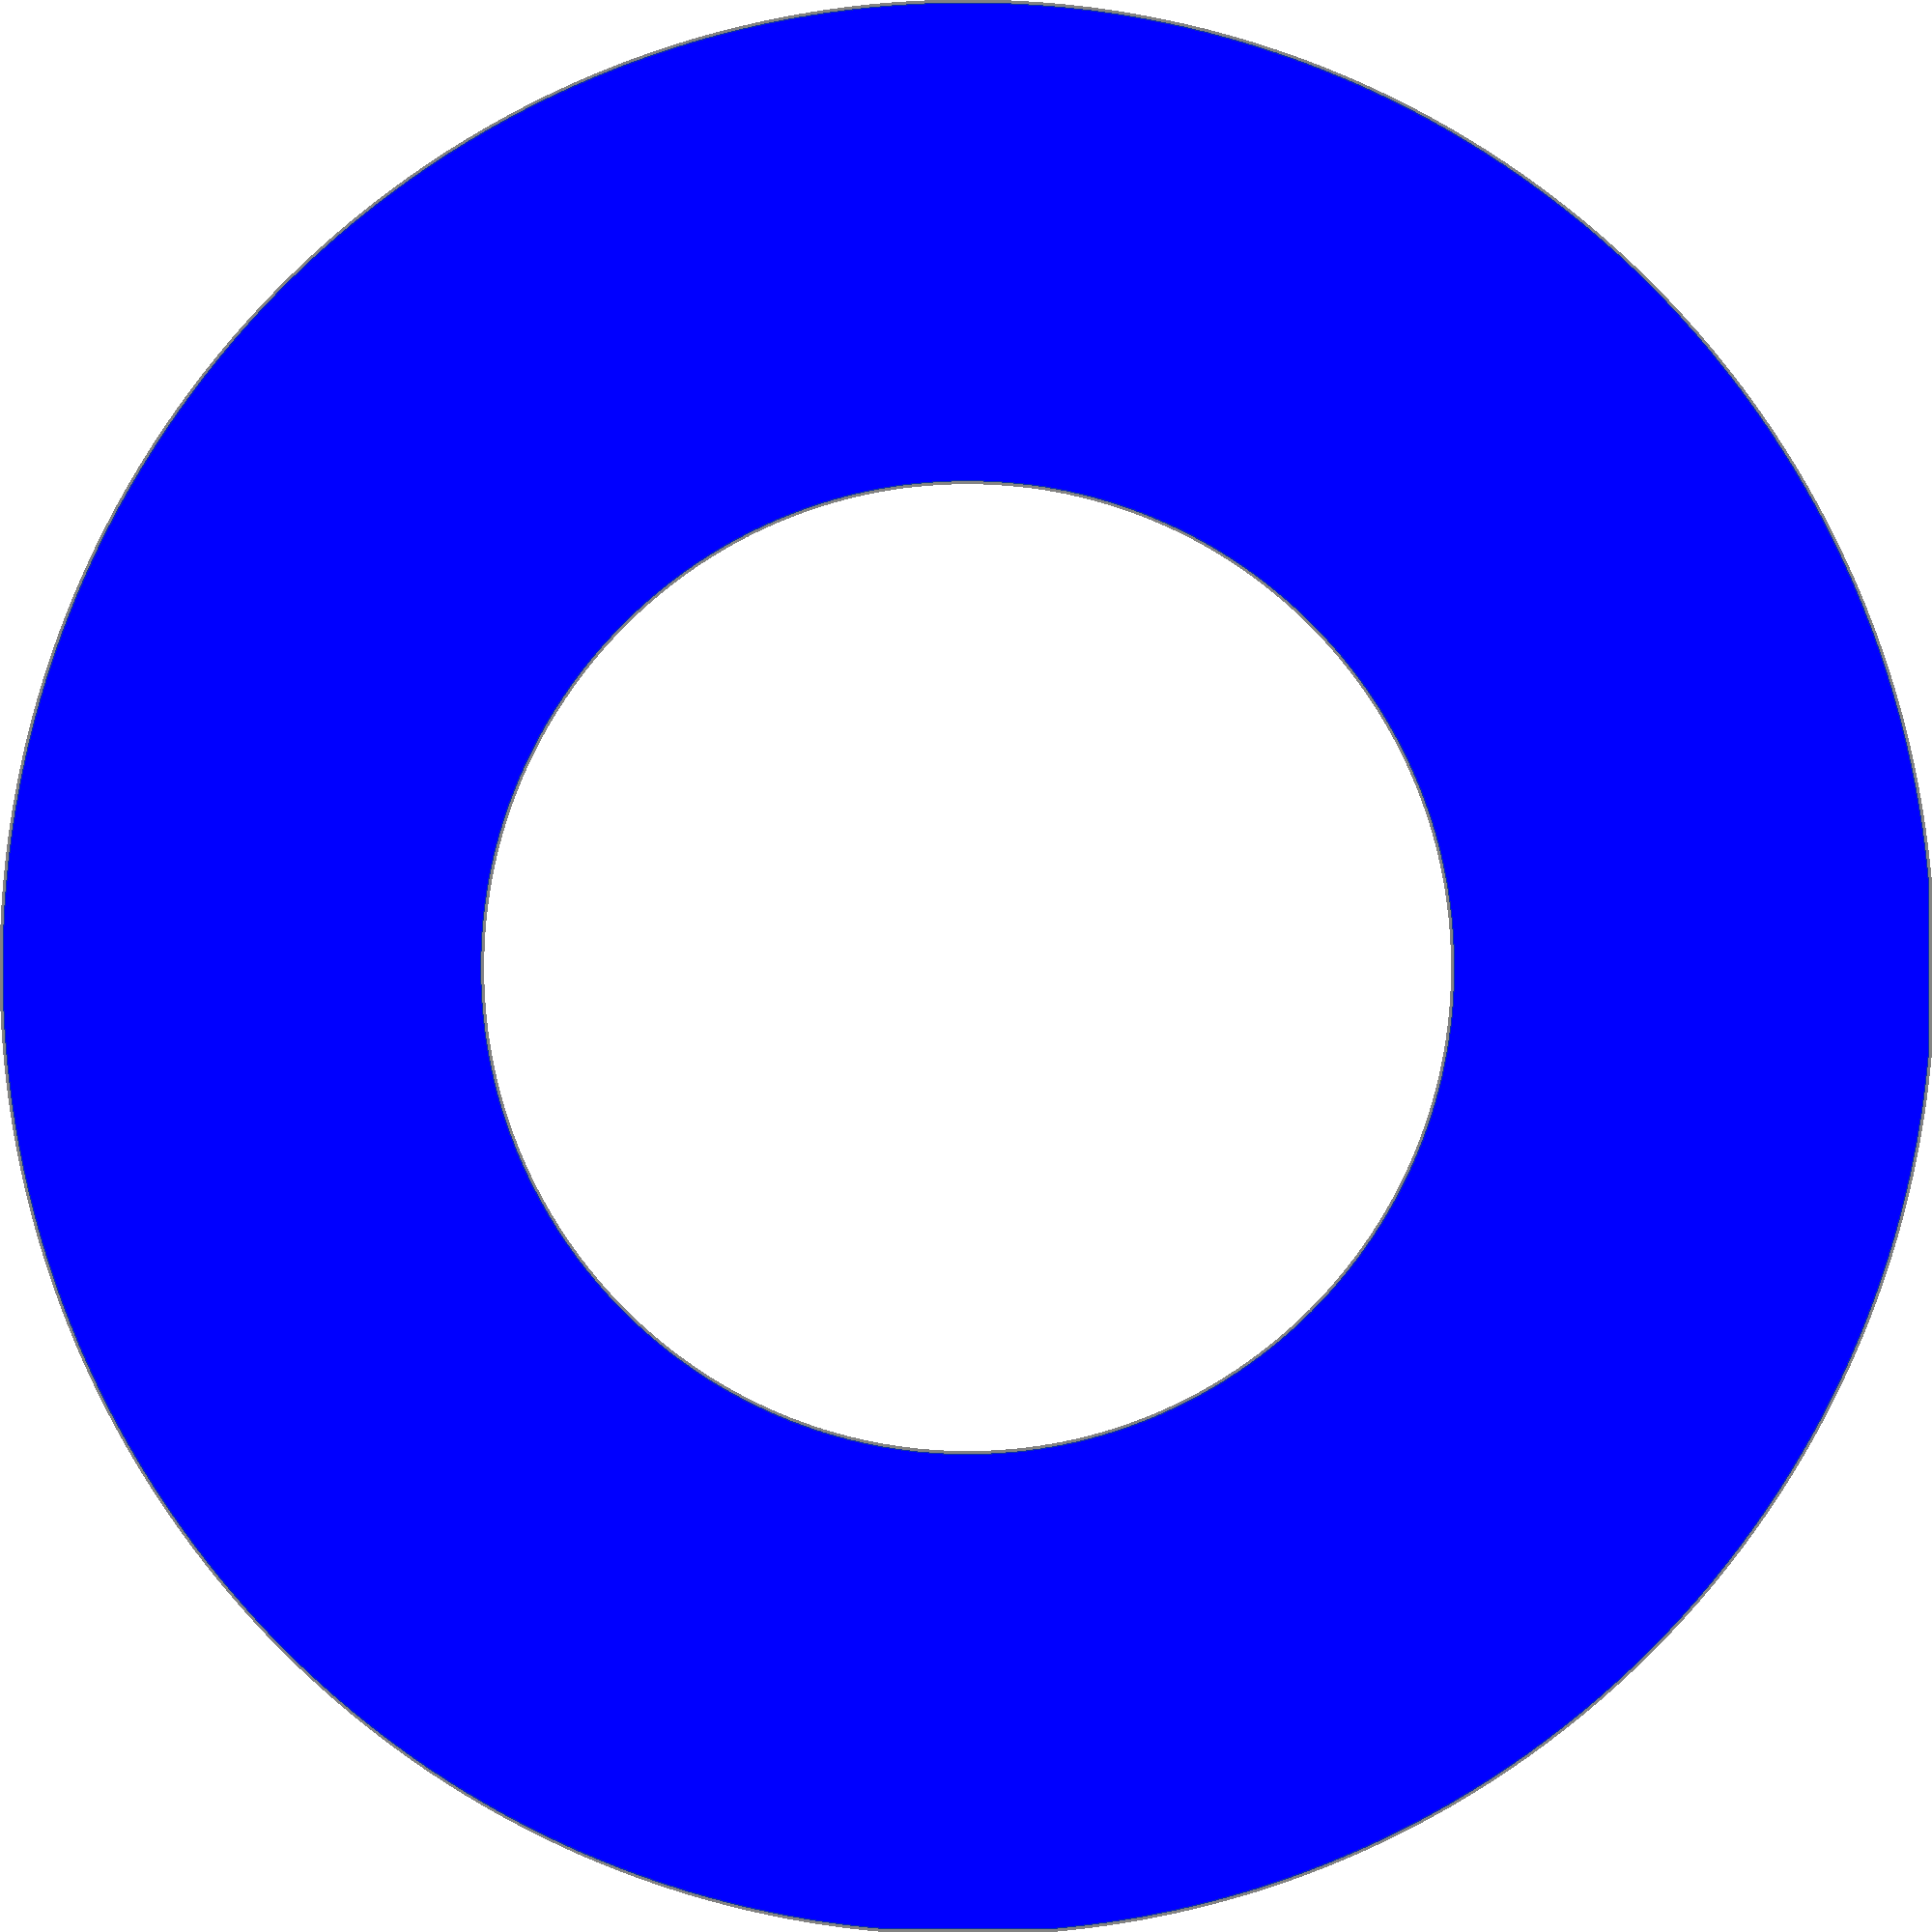 2000x2000 Fileblue Circle.png